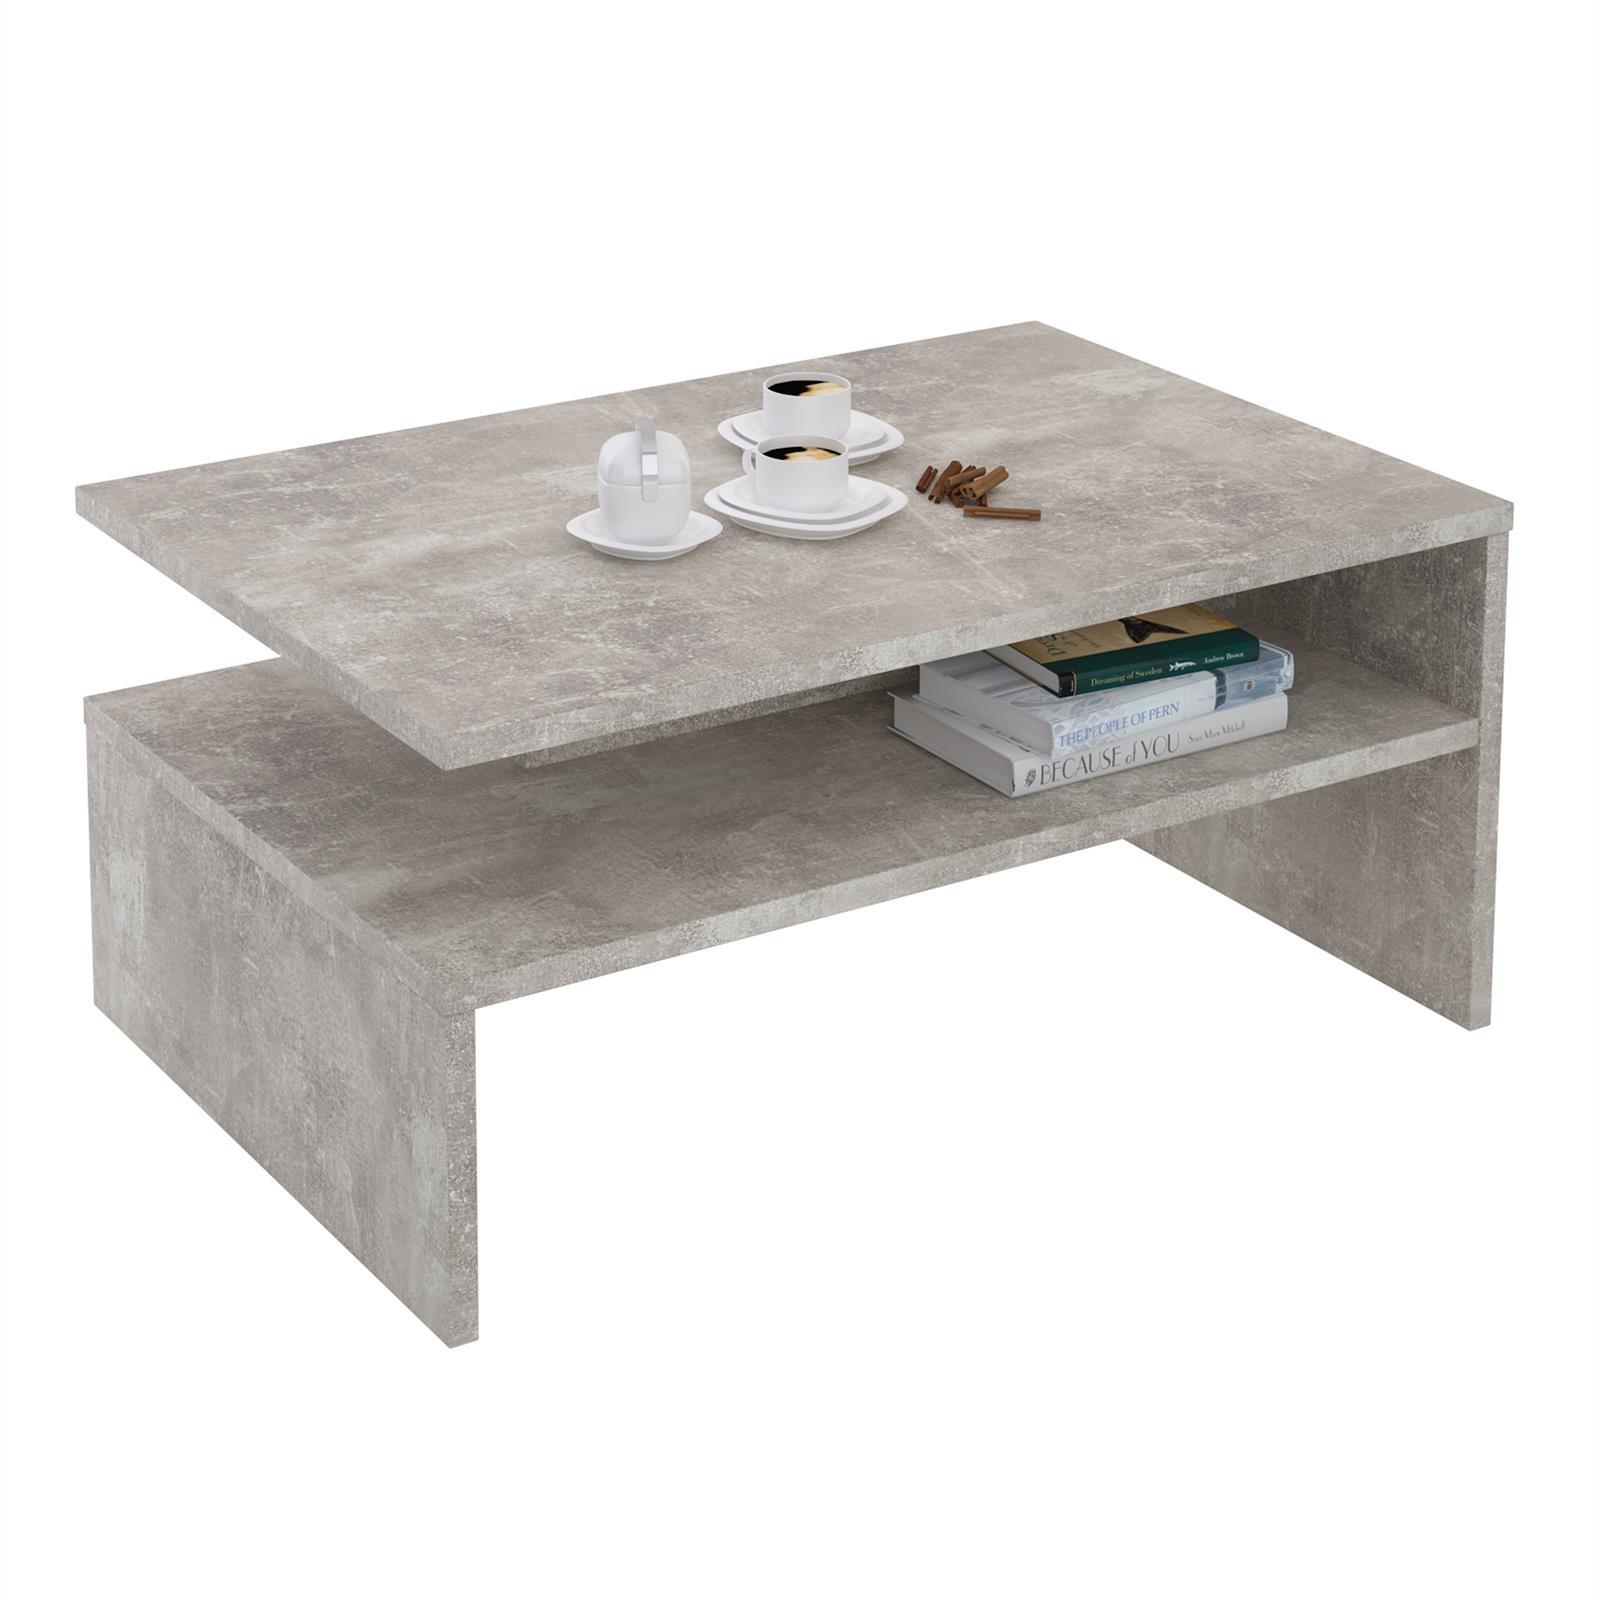 table basse adelaide en m lamin d cor b ton mobil. Black Bedroom Furniture Sets. Home Design Ideas